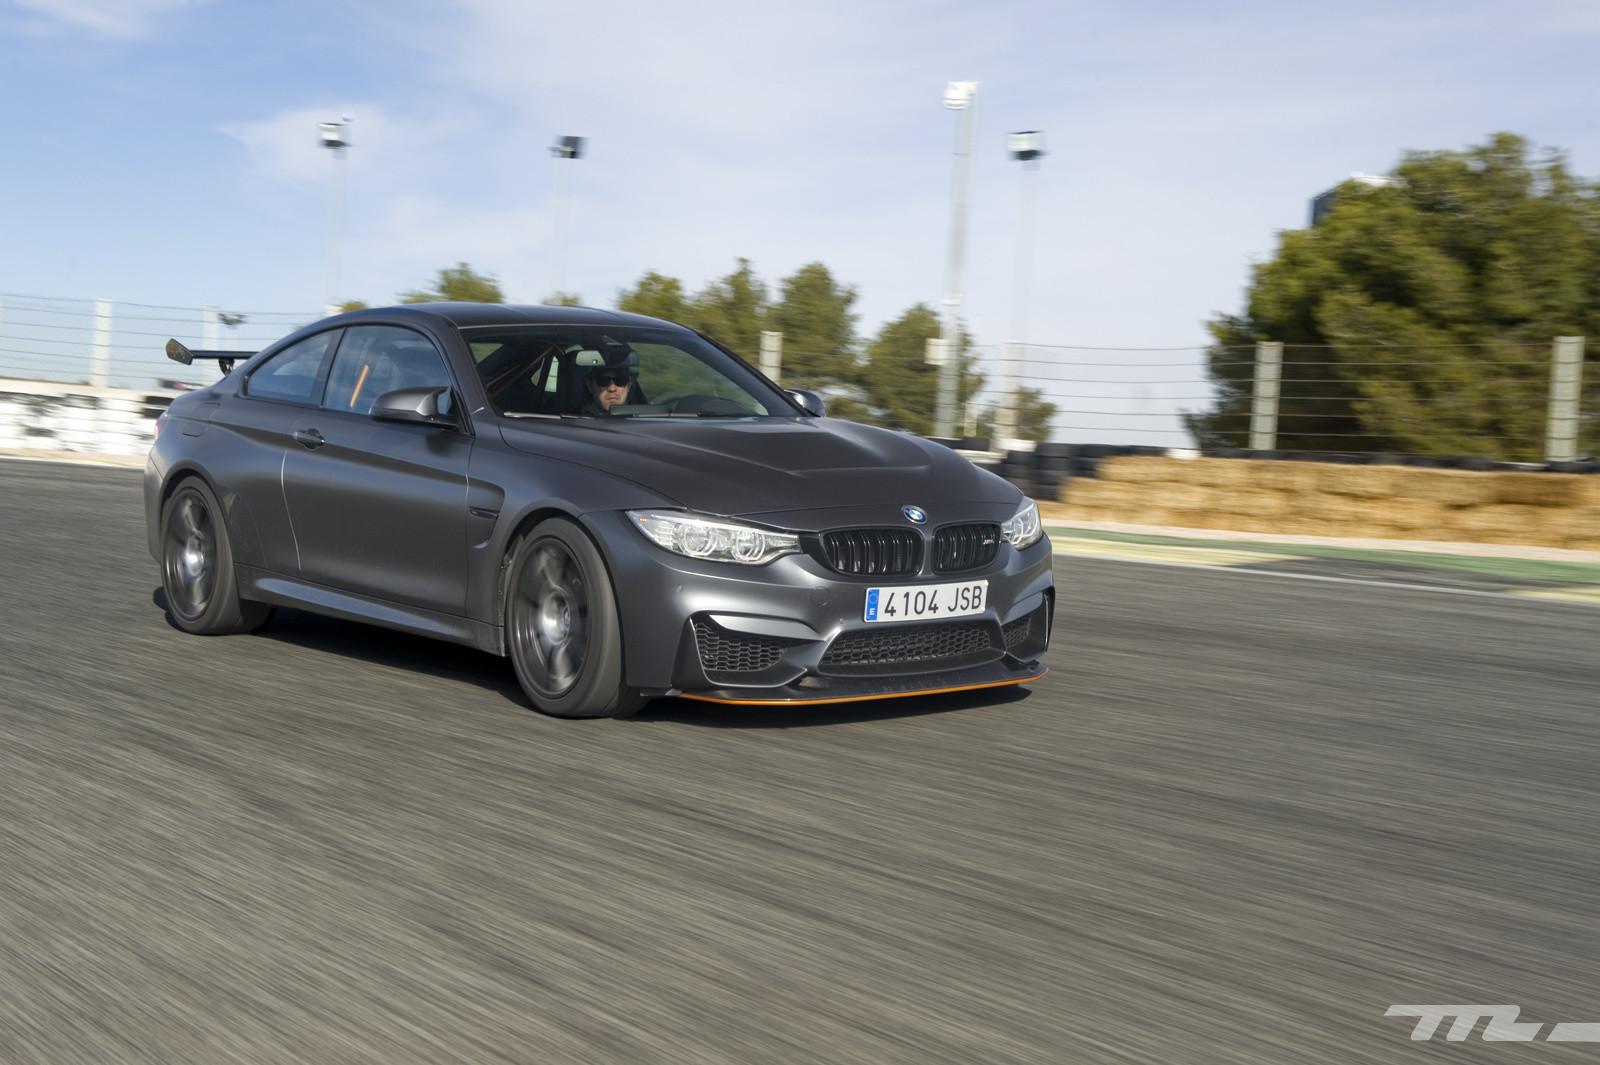 Foto de BMW M4 GTS (Prueba) (34/38)